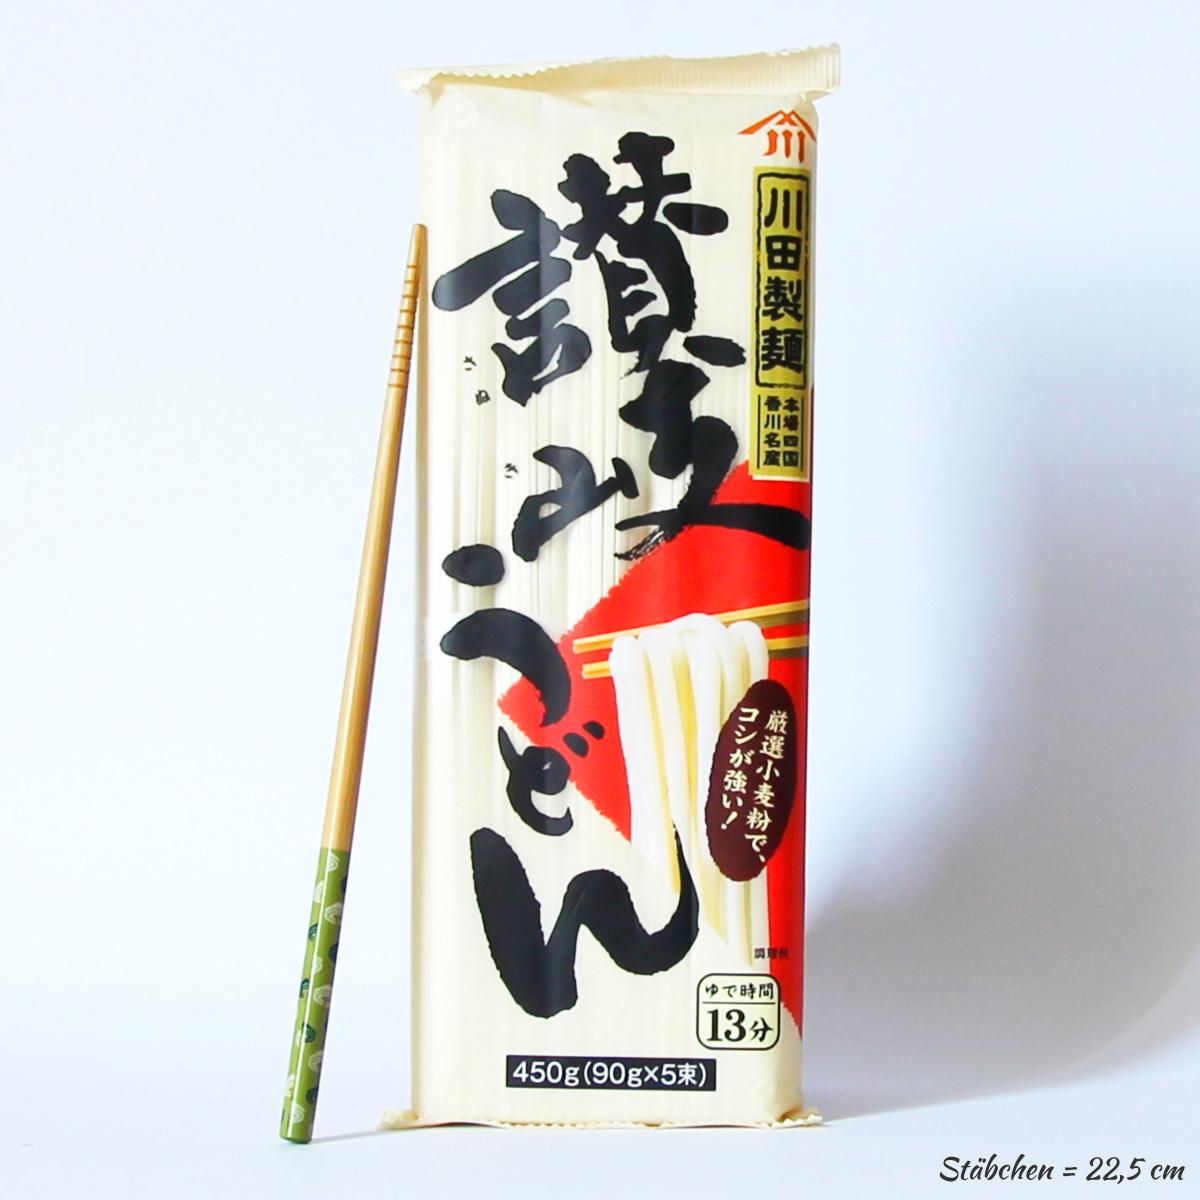 Udon Nudeln 450g (5 Portionen Sanuki Udon), NISSHIN